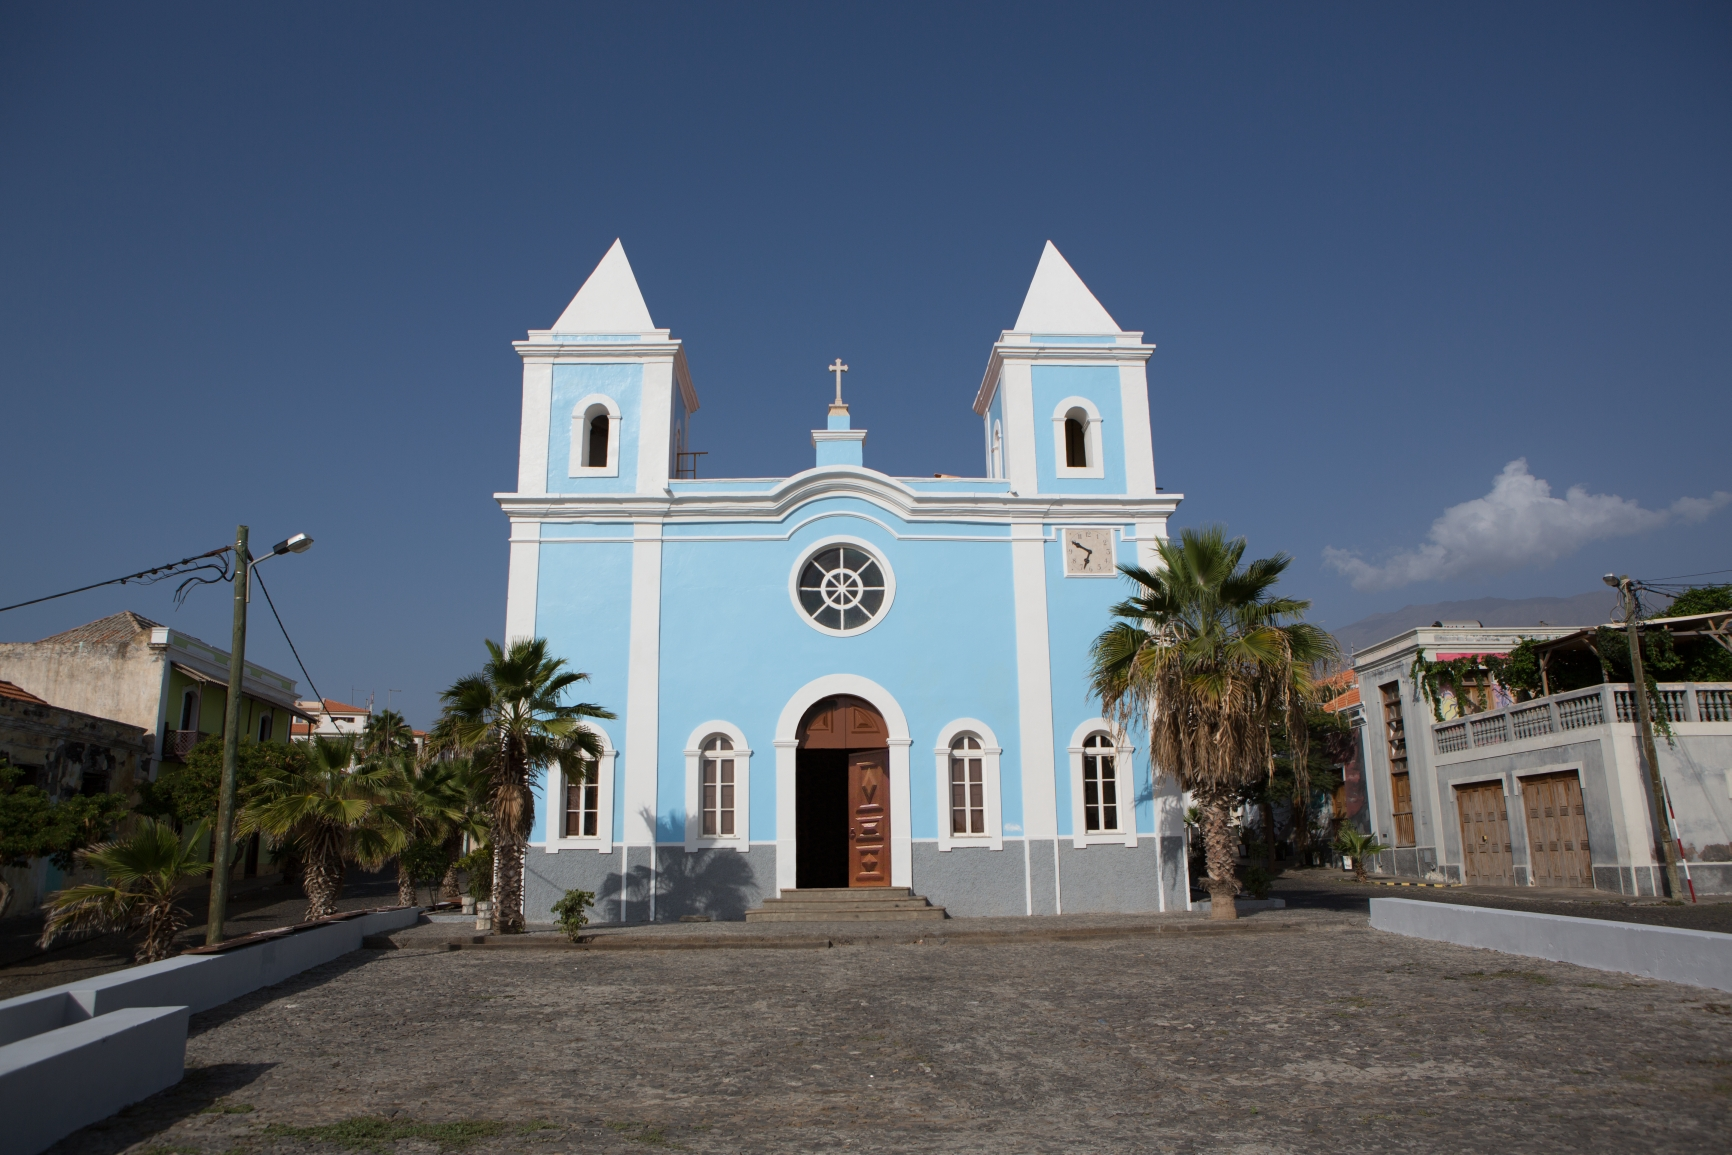 Fogo - Sao Filipe